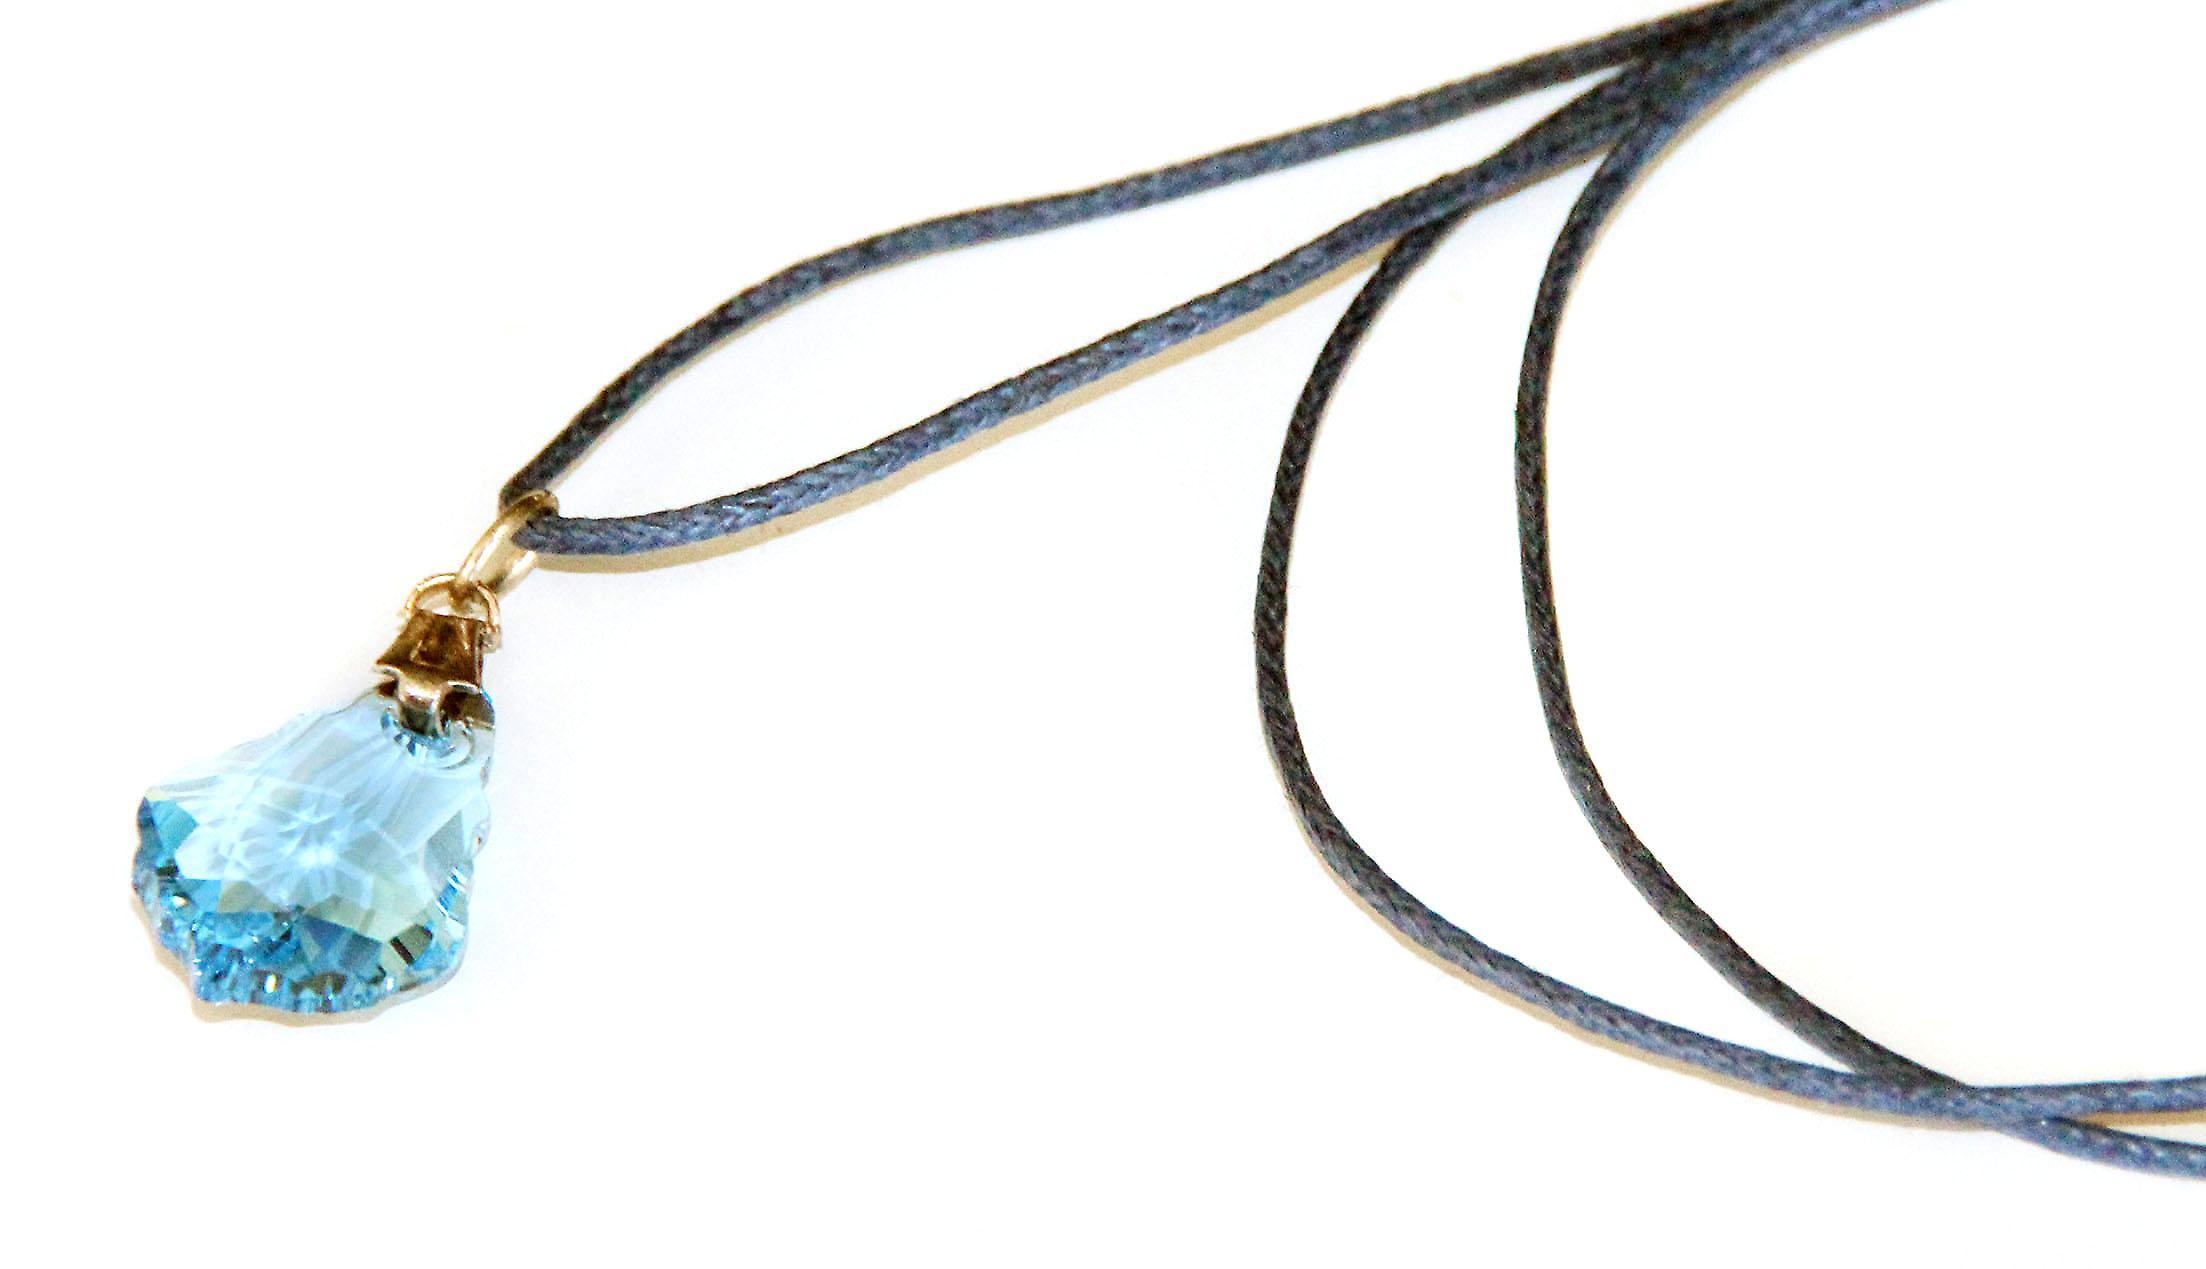 Waooh - Jewelry - Swarovski / blue teardrop pendant and waxed cord - Small